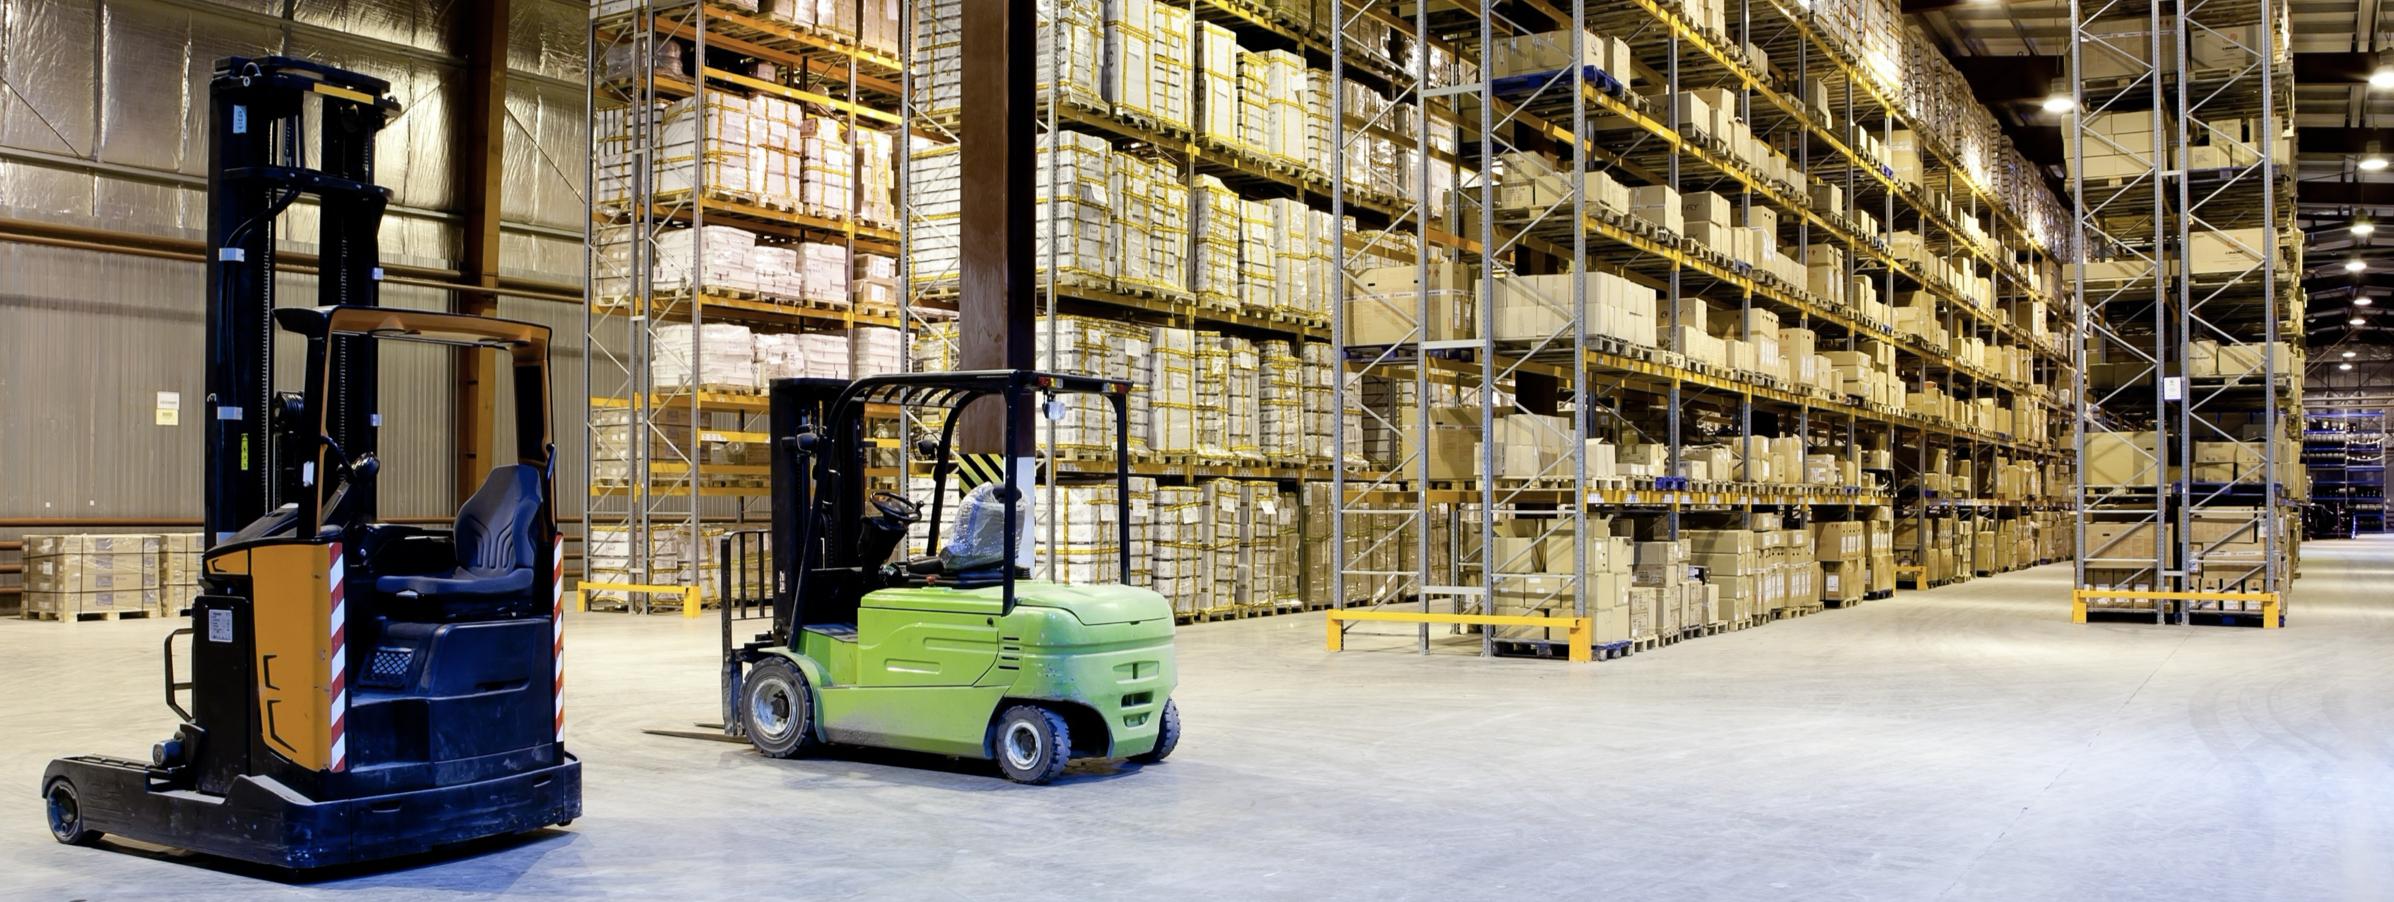 Reduct_Case_Study6_Forklift_Green_Orange_Stockroom